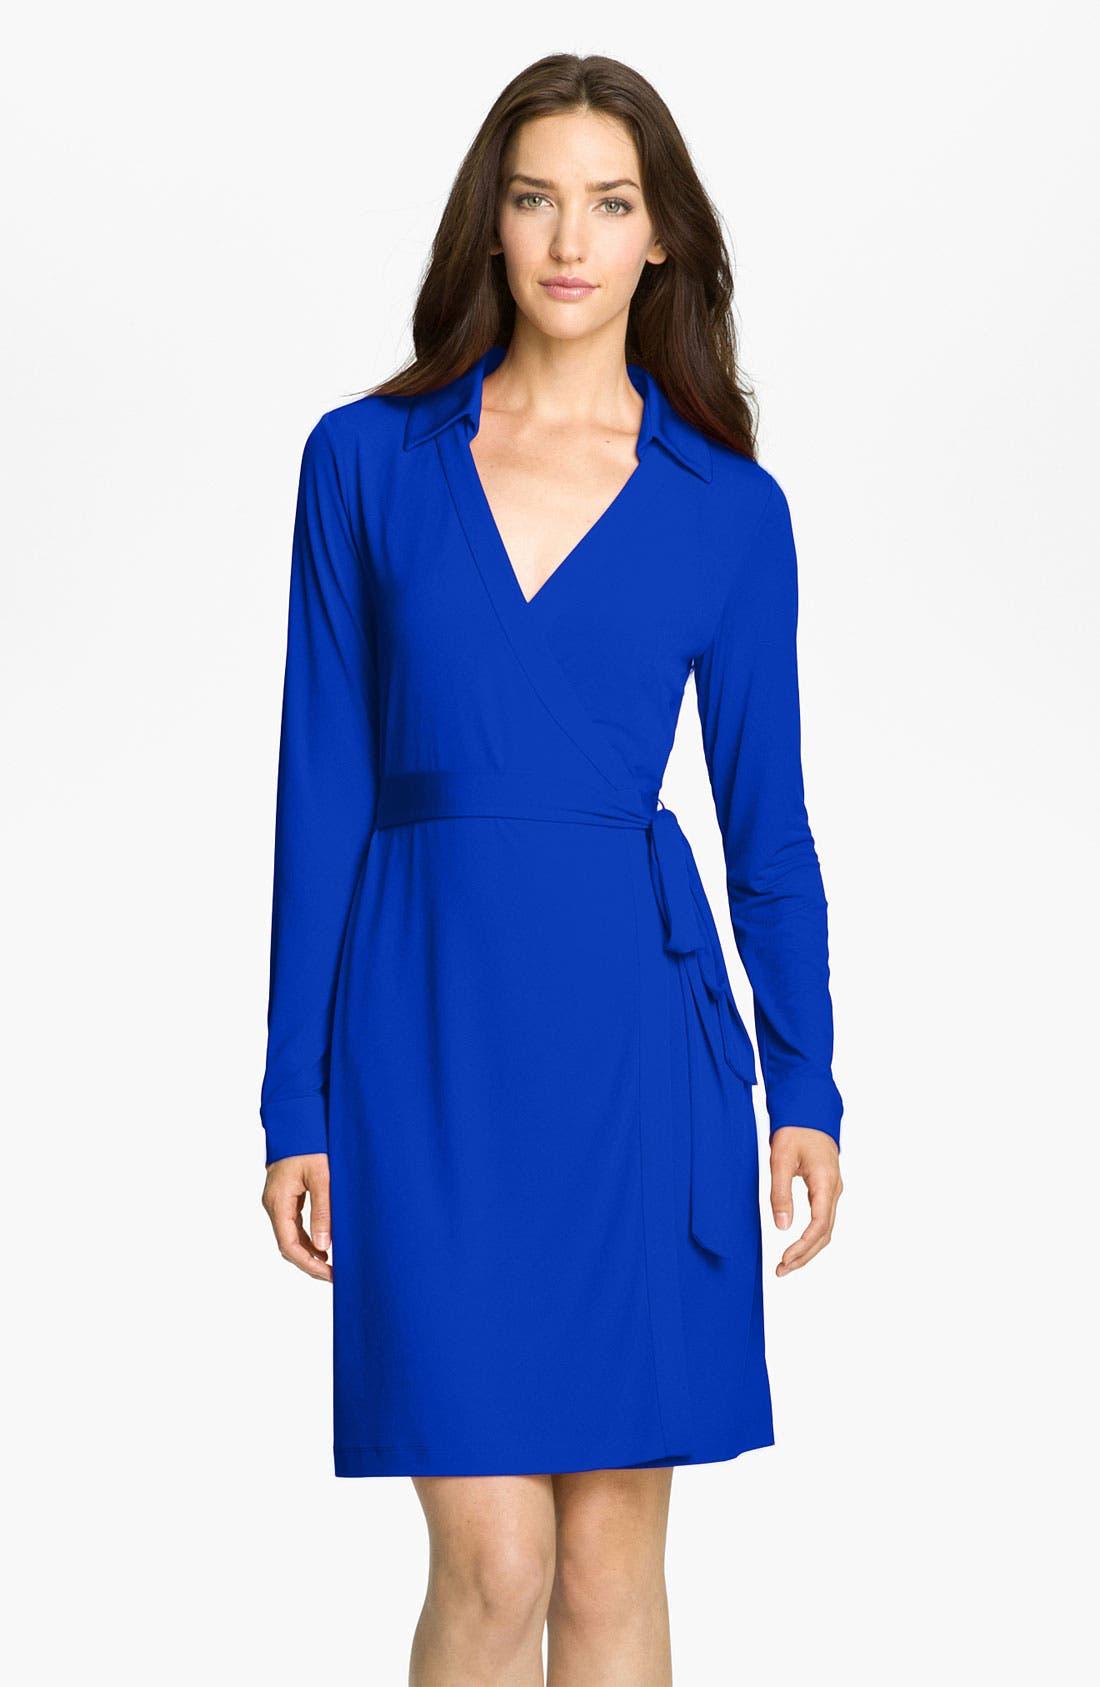 Alternate Image 1 Selected - Calvin Klein Collared Jersey Wrap Dress (Petite)